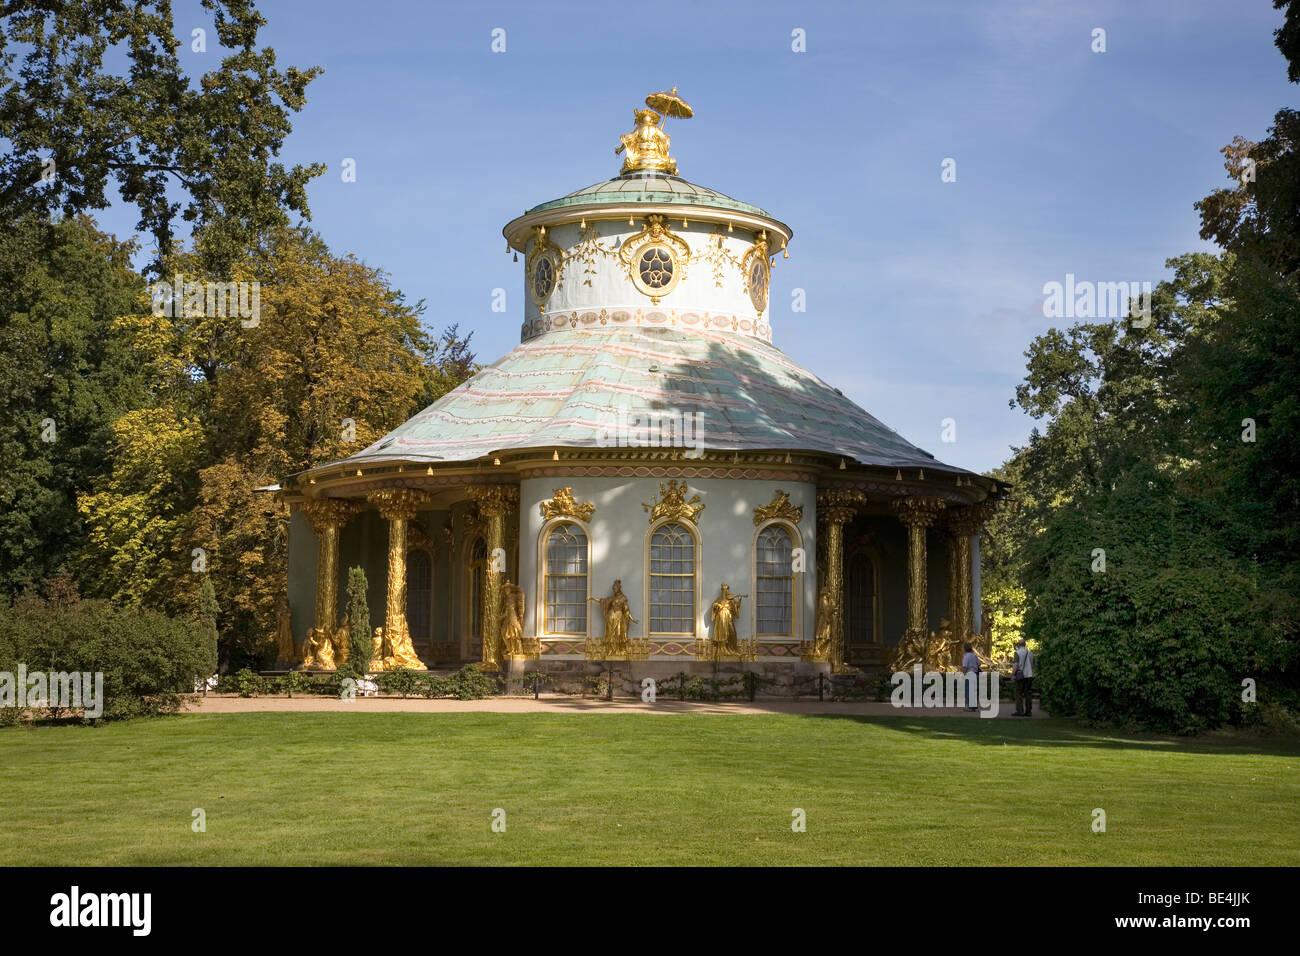 Chinese Tea House, Sanssouci Park, Potsdam, Brandenburg, Germany - Stock Image